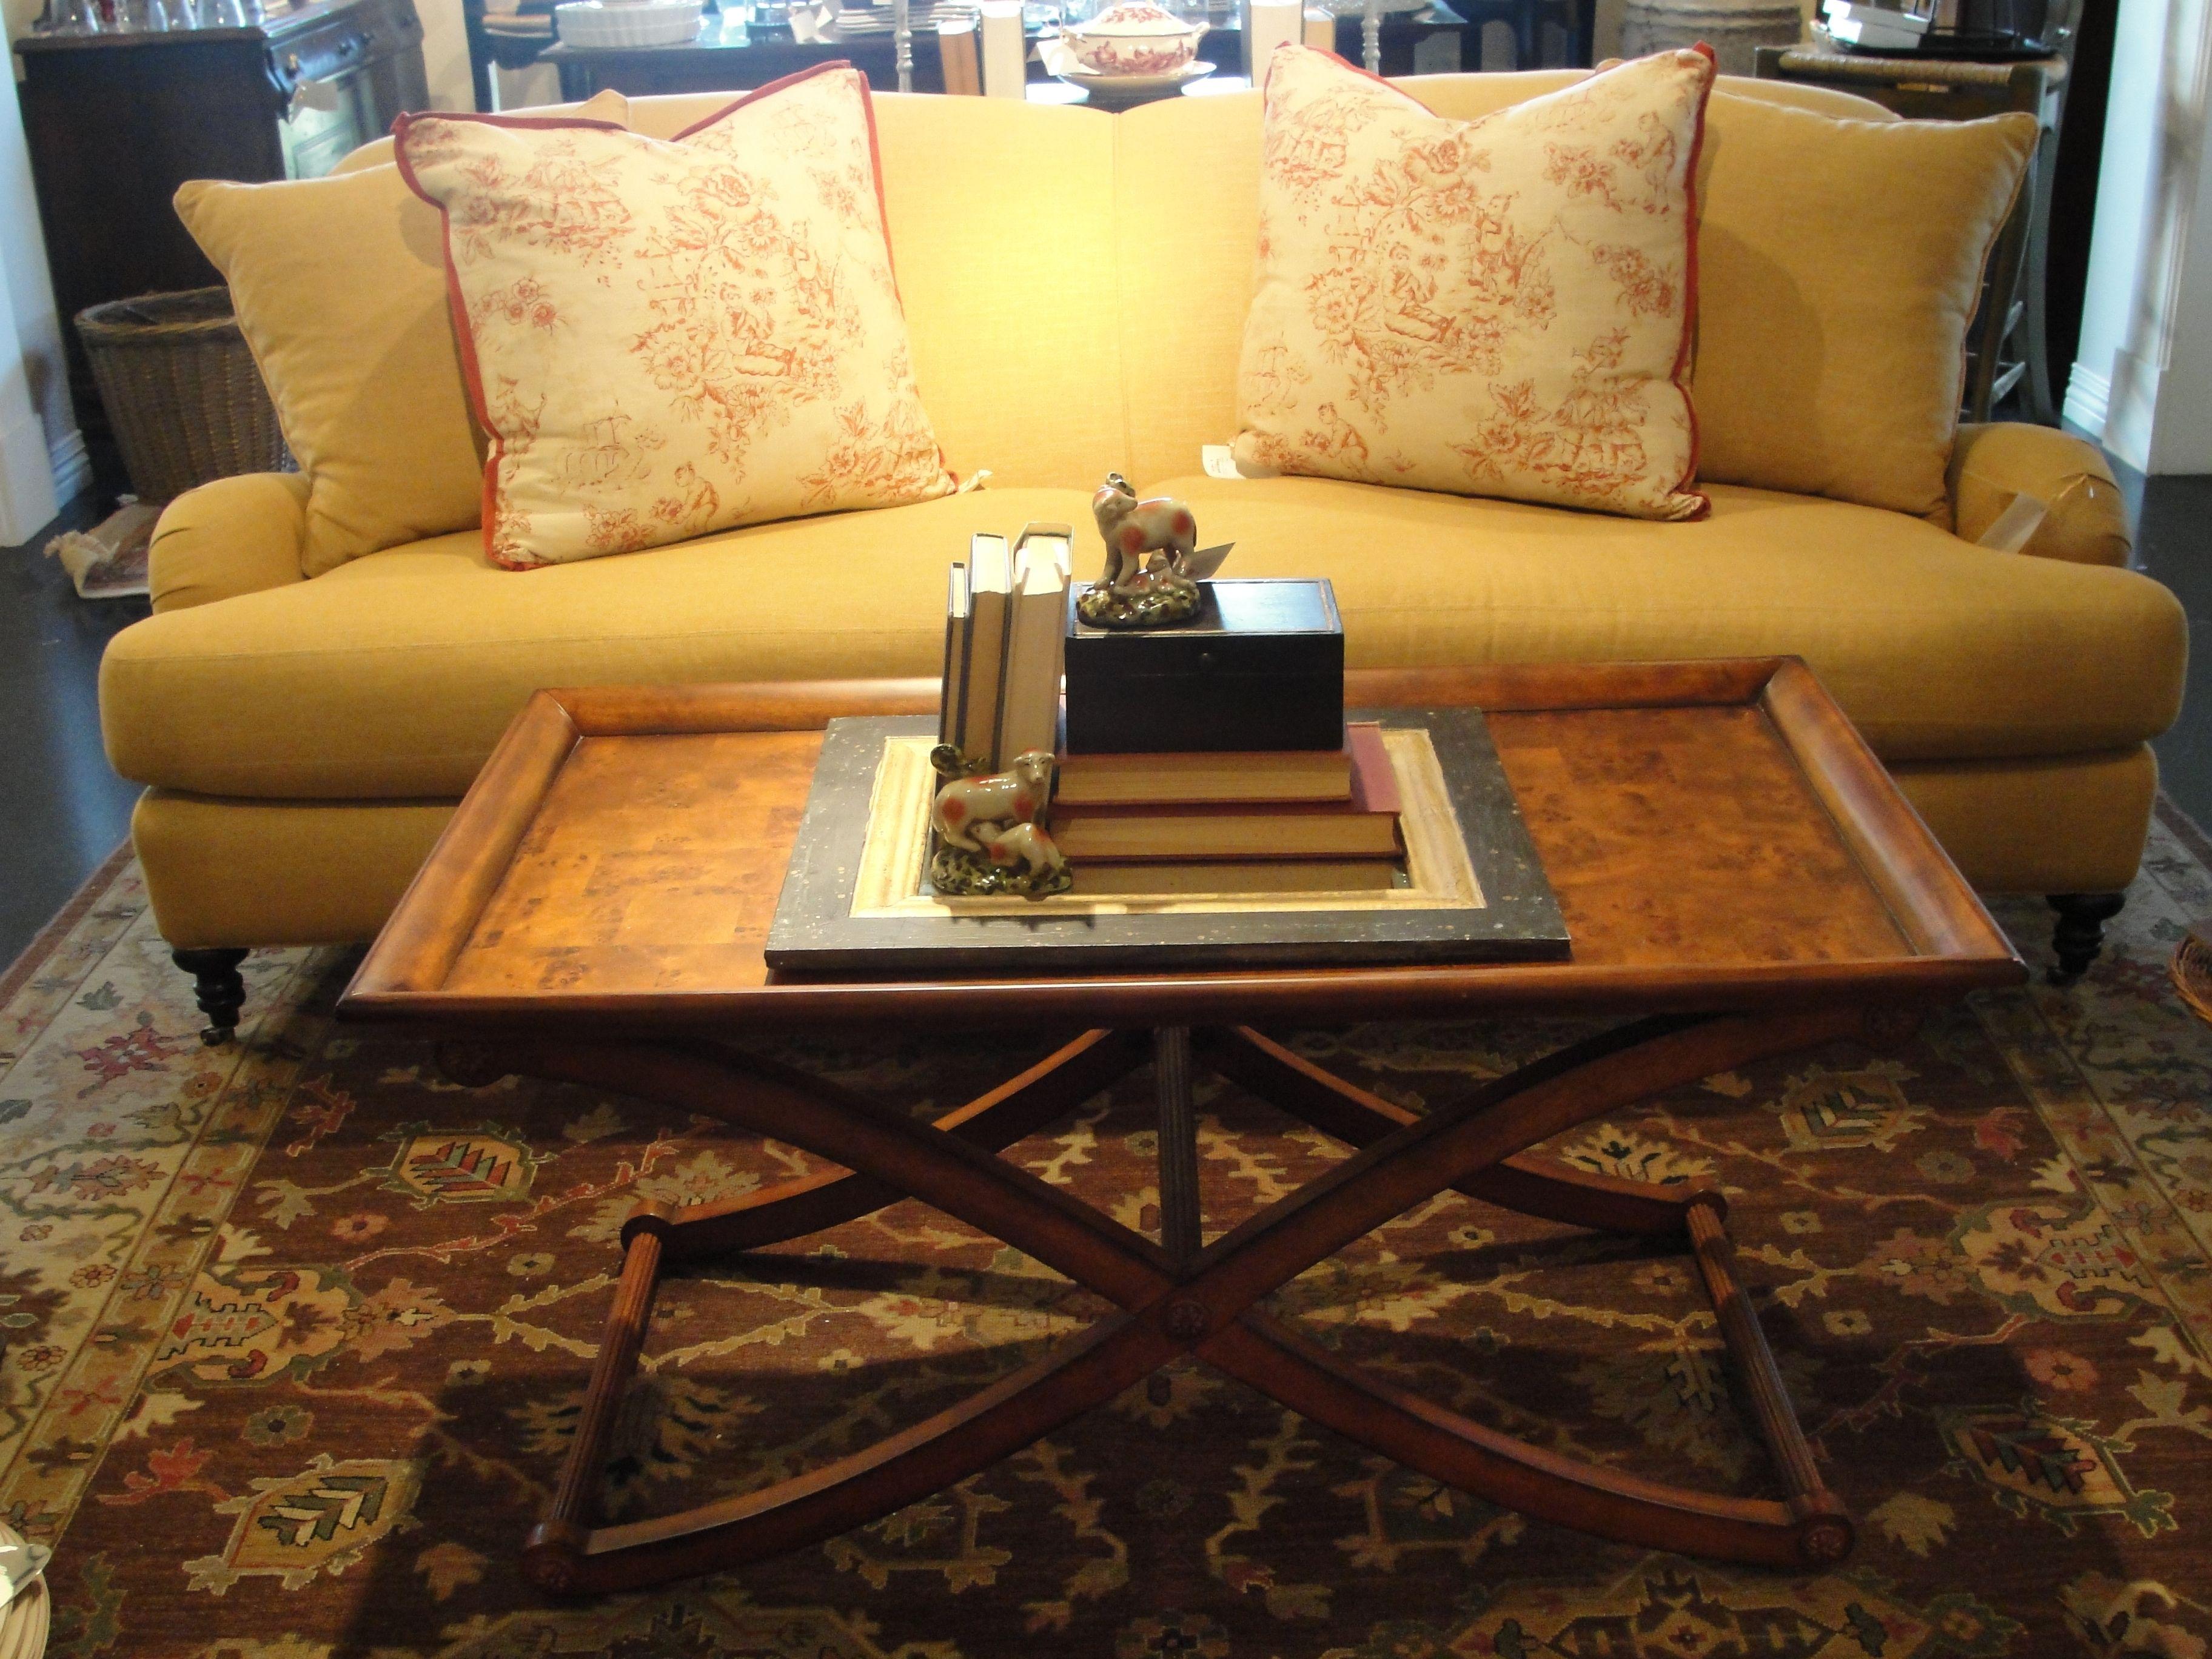 Living Room Table Decor Coffee Table Ideas Home Sweet Home Pinterest Creativo